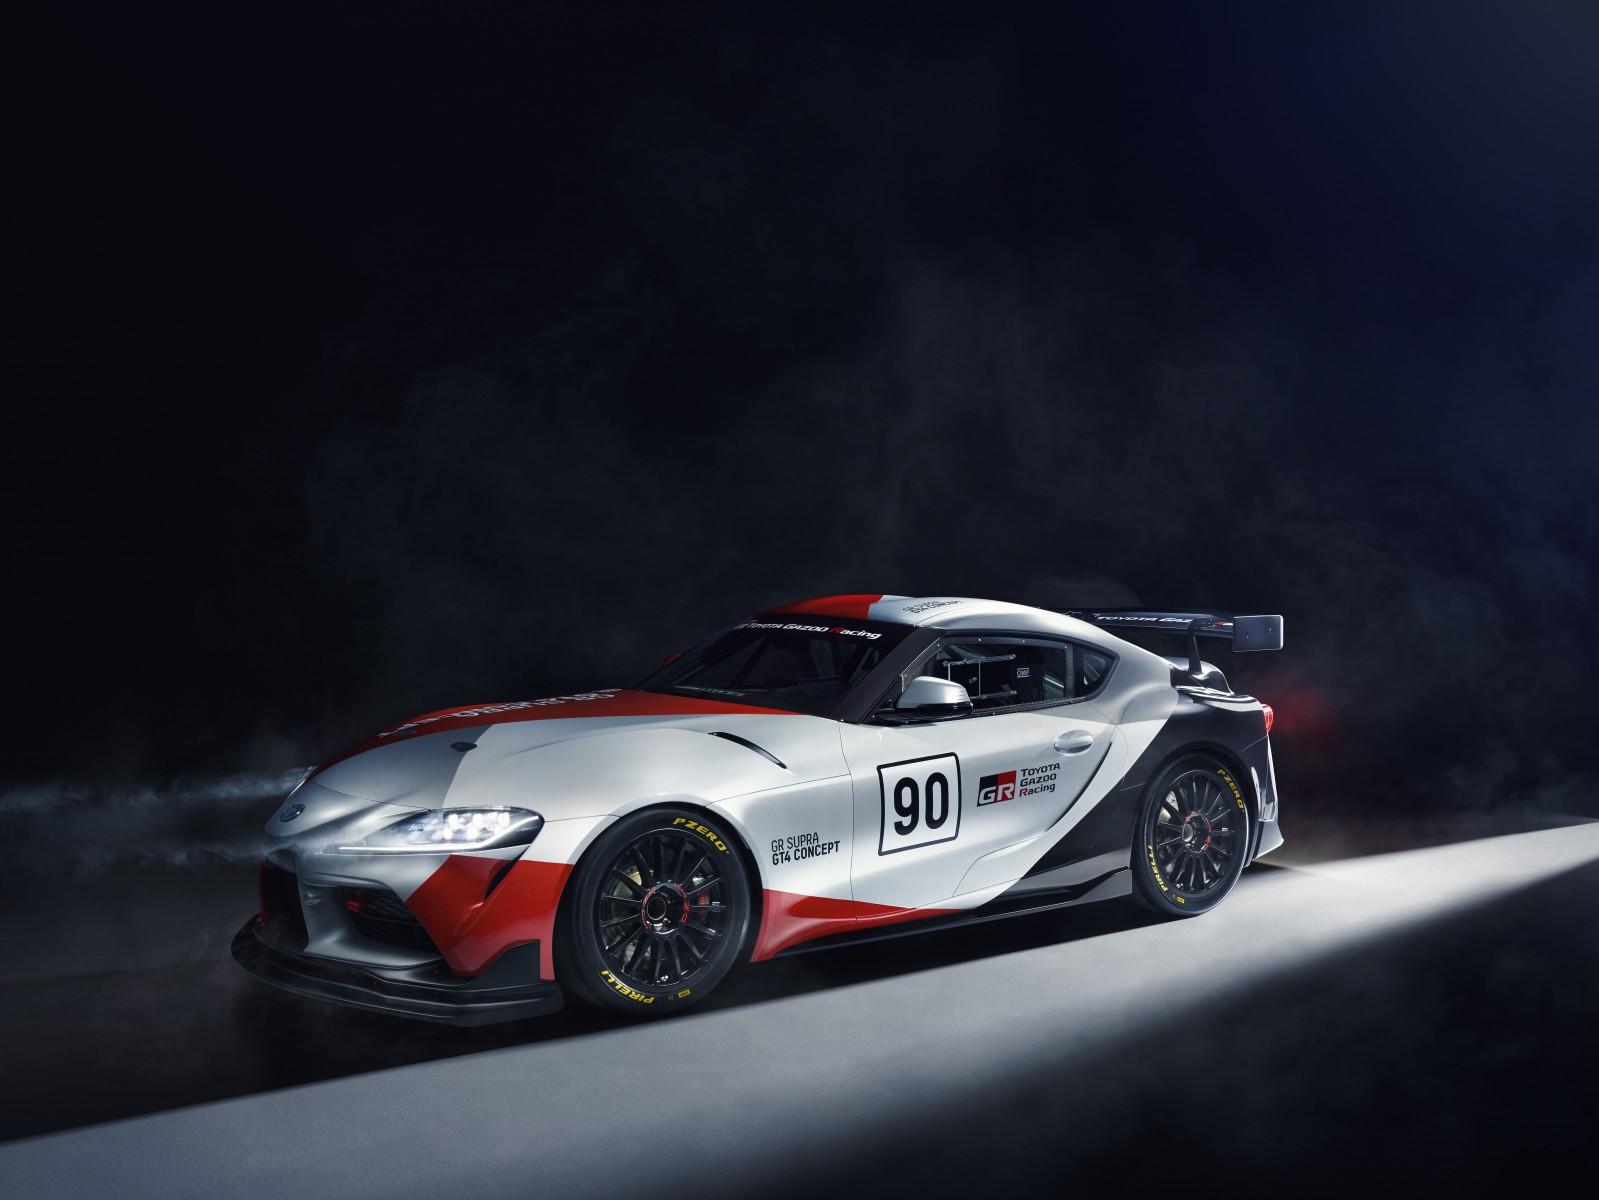 2019 Toyota GR Supra GT4 Concept